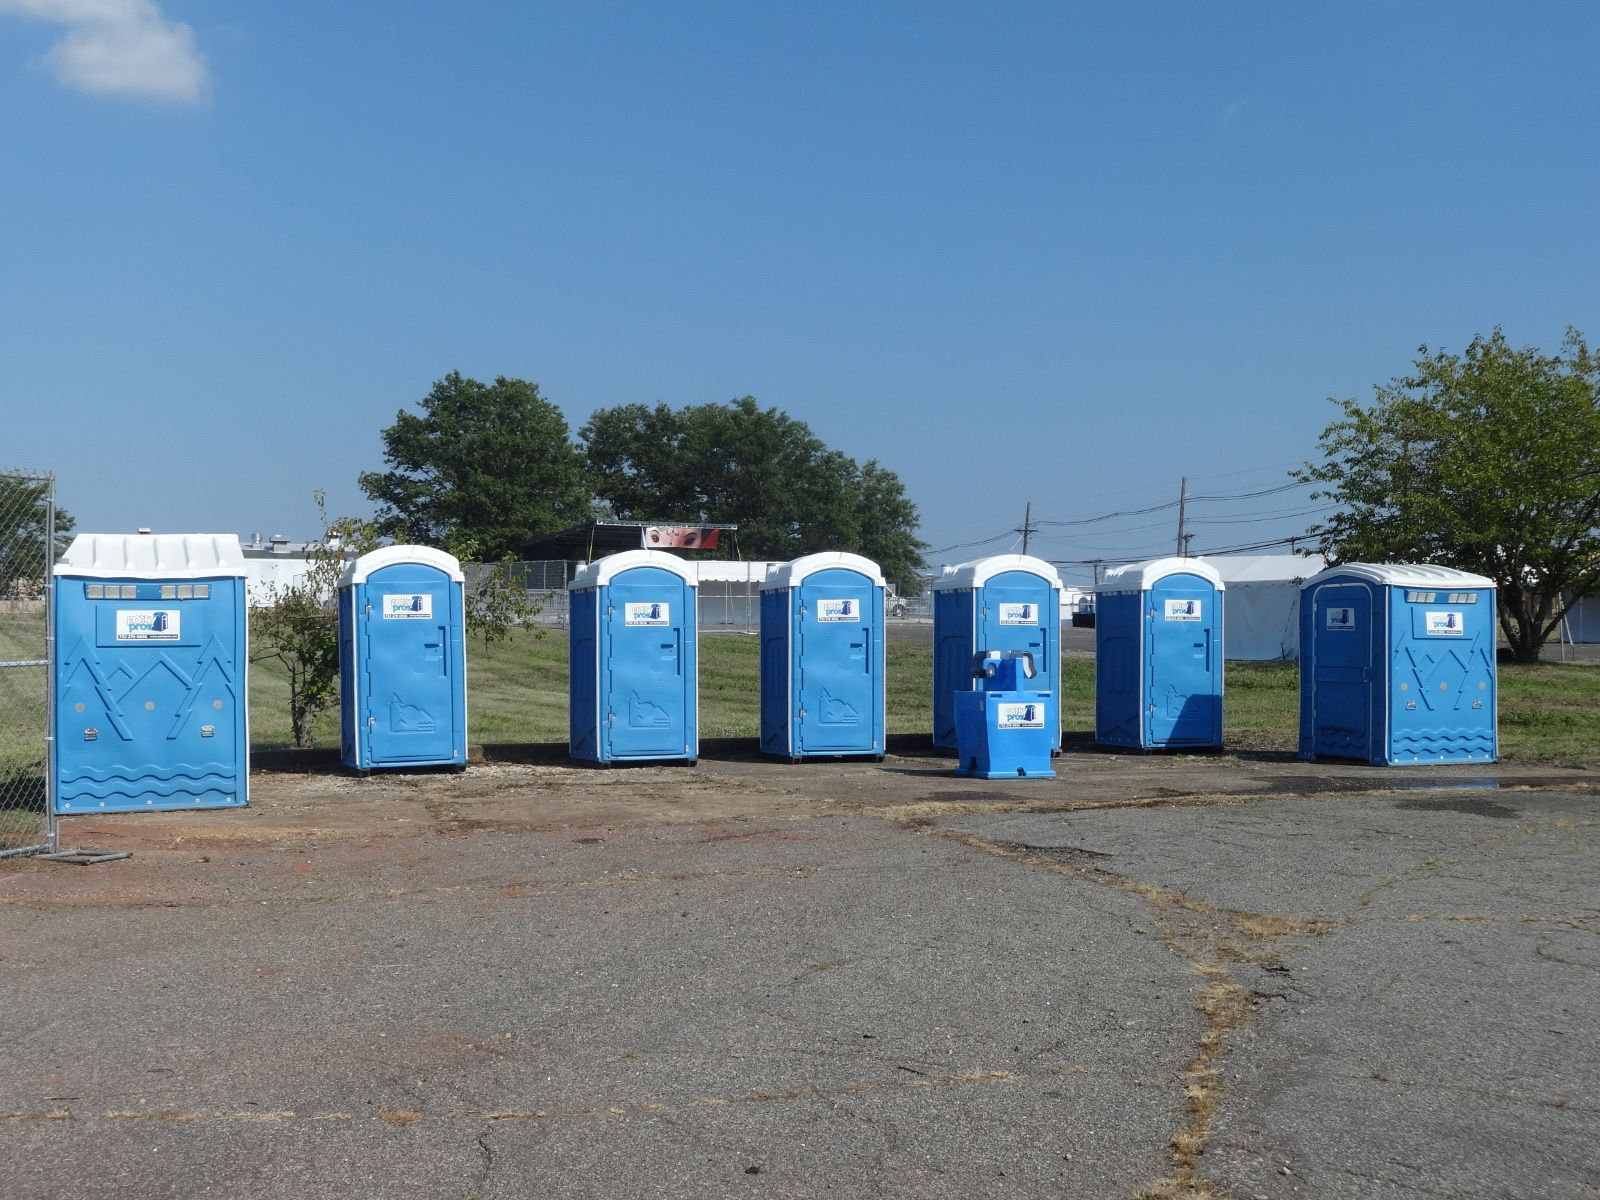 Potty pros has been a leading porta potty rental and porta